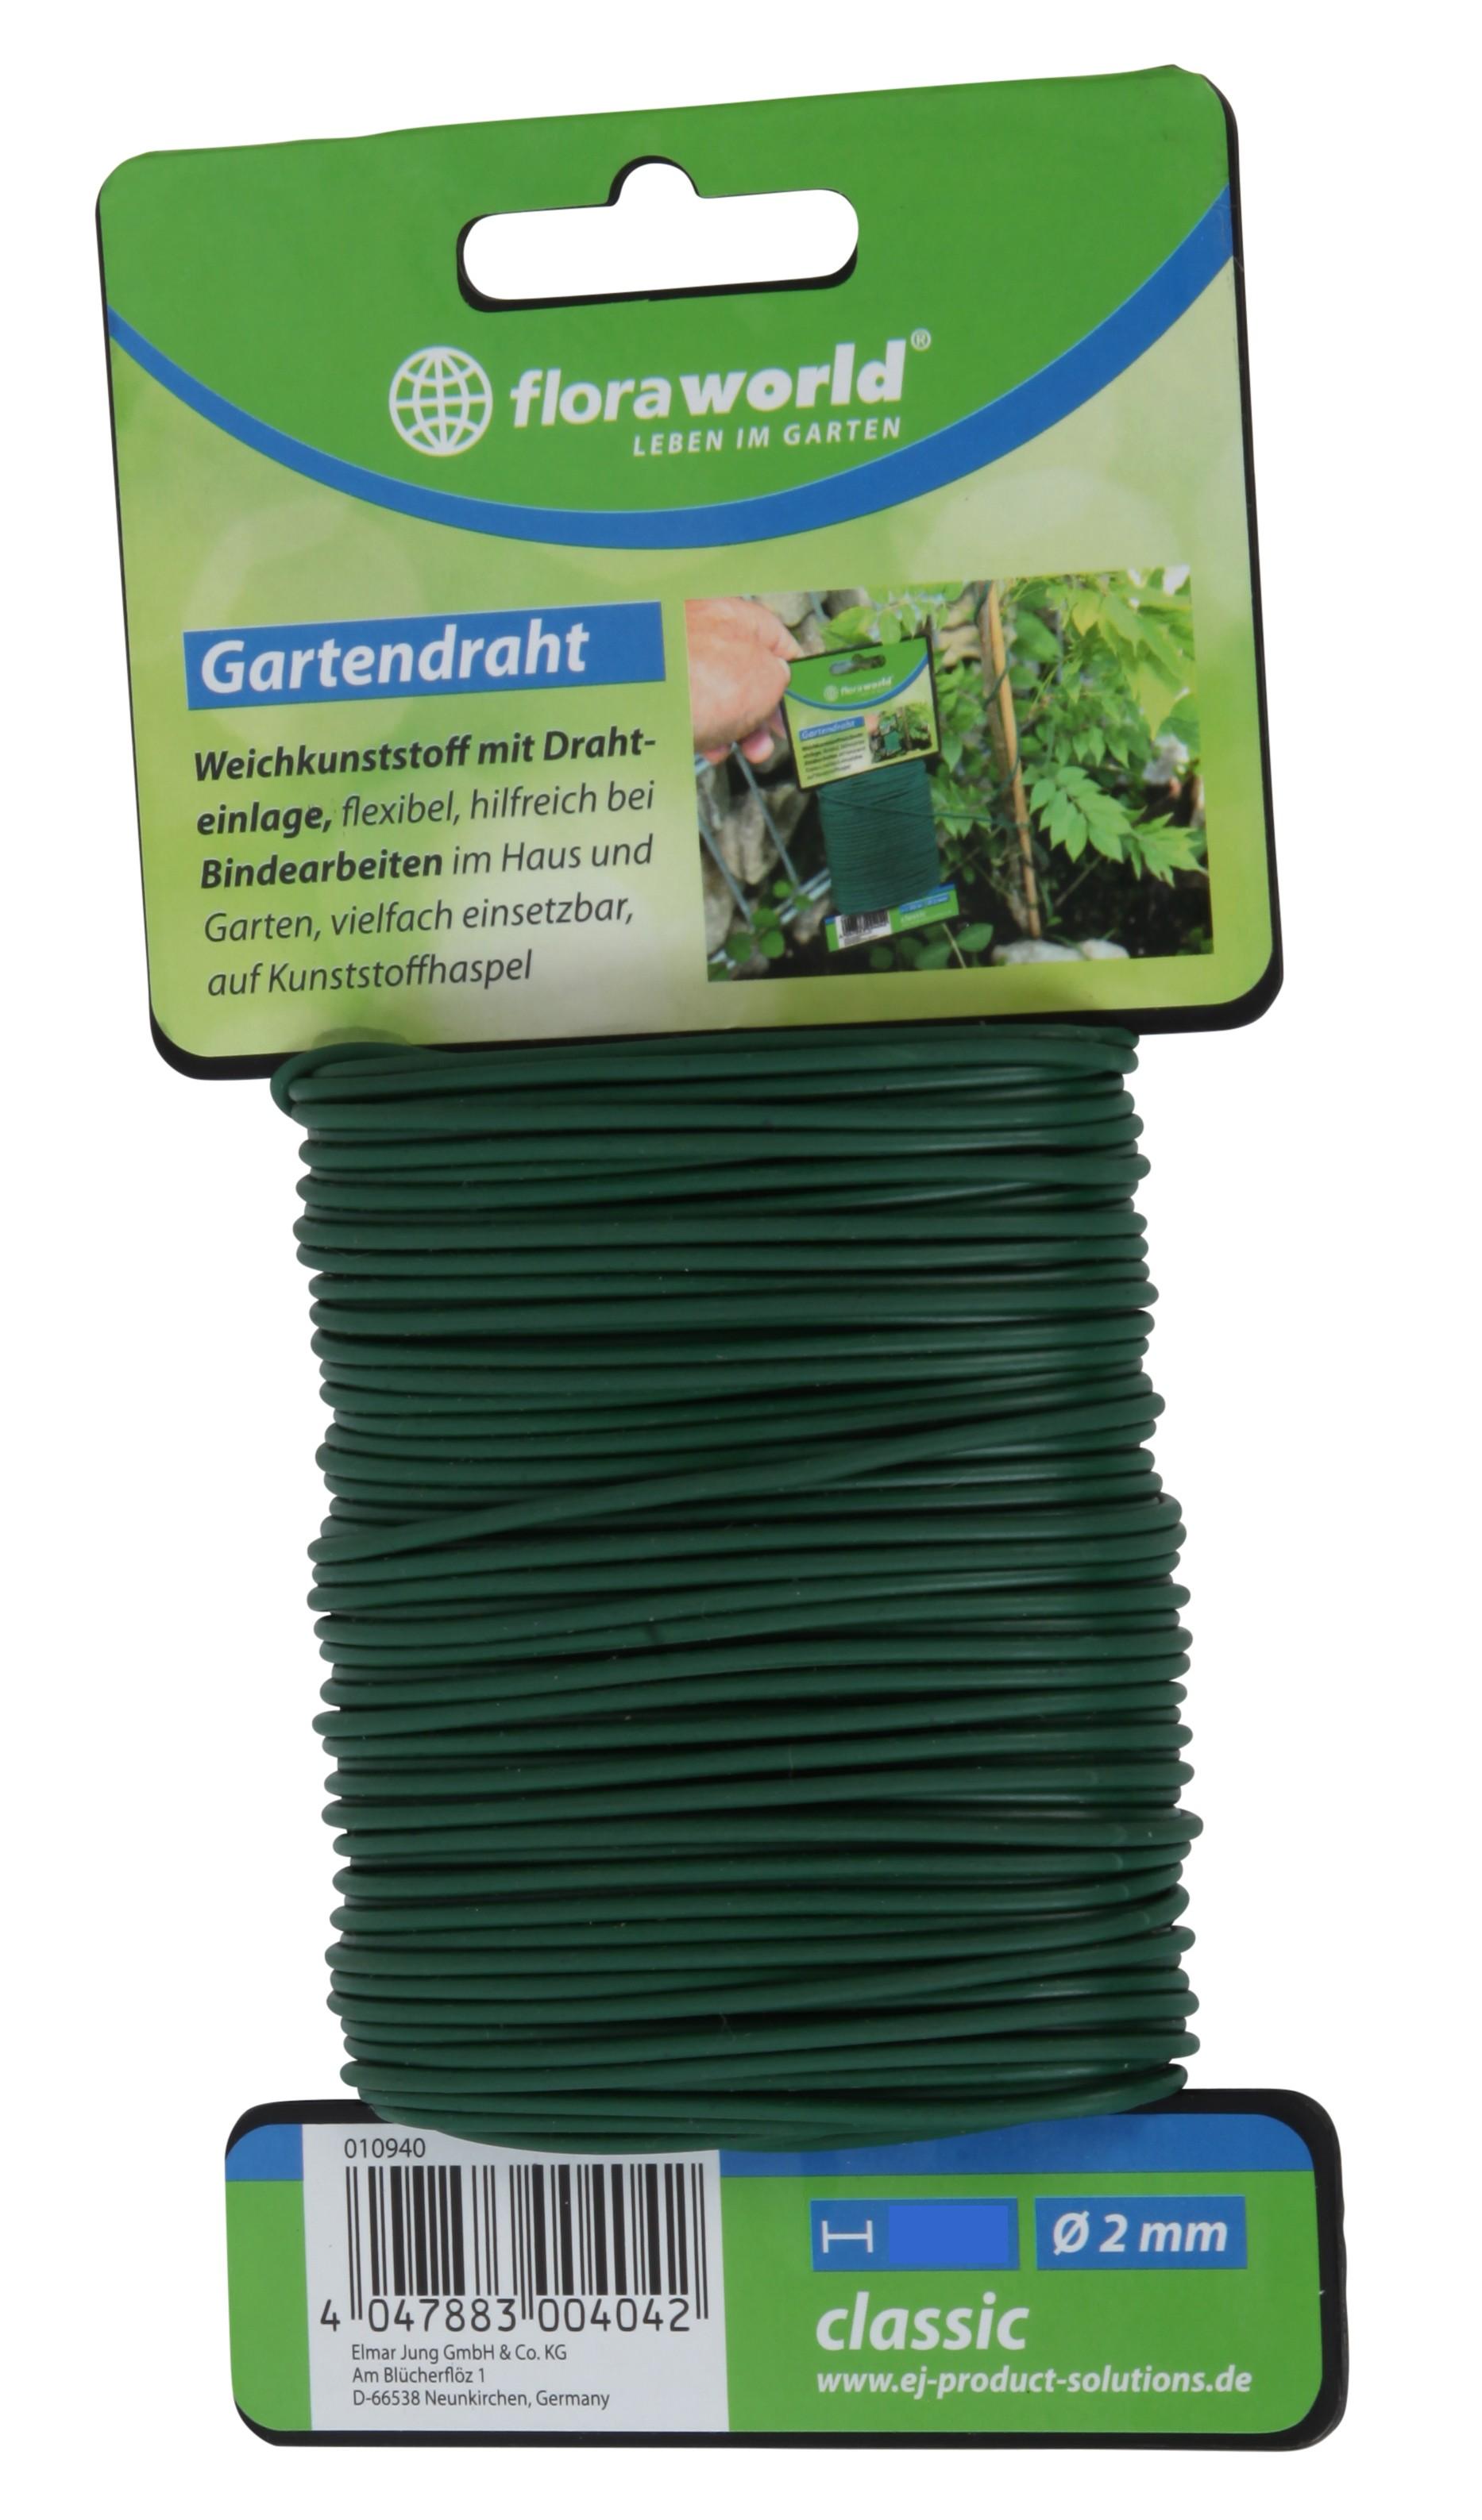 Gartendraht Weichkunststoff classic floraworld Ø 2mm Länge 30m Bild 1